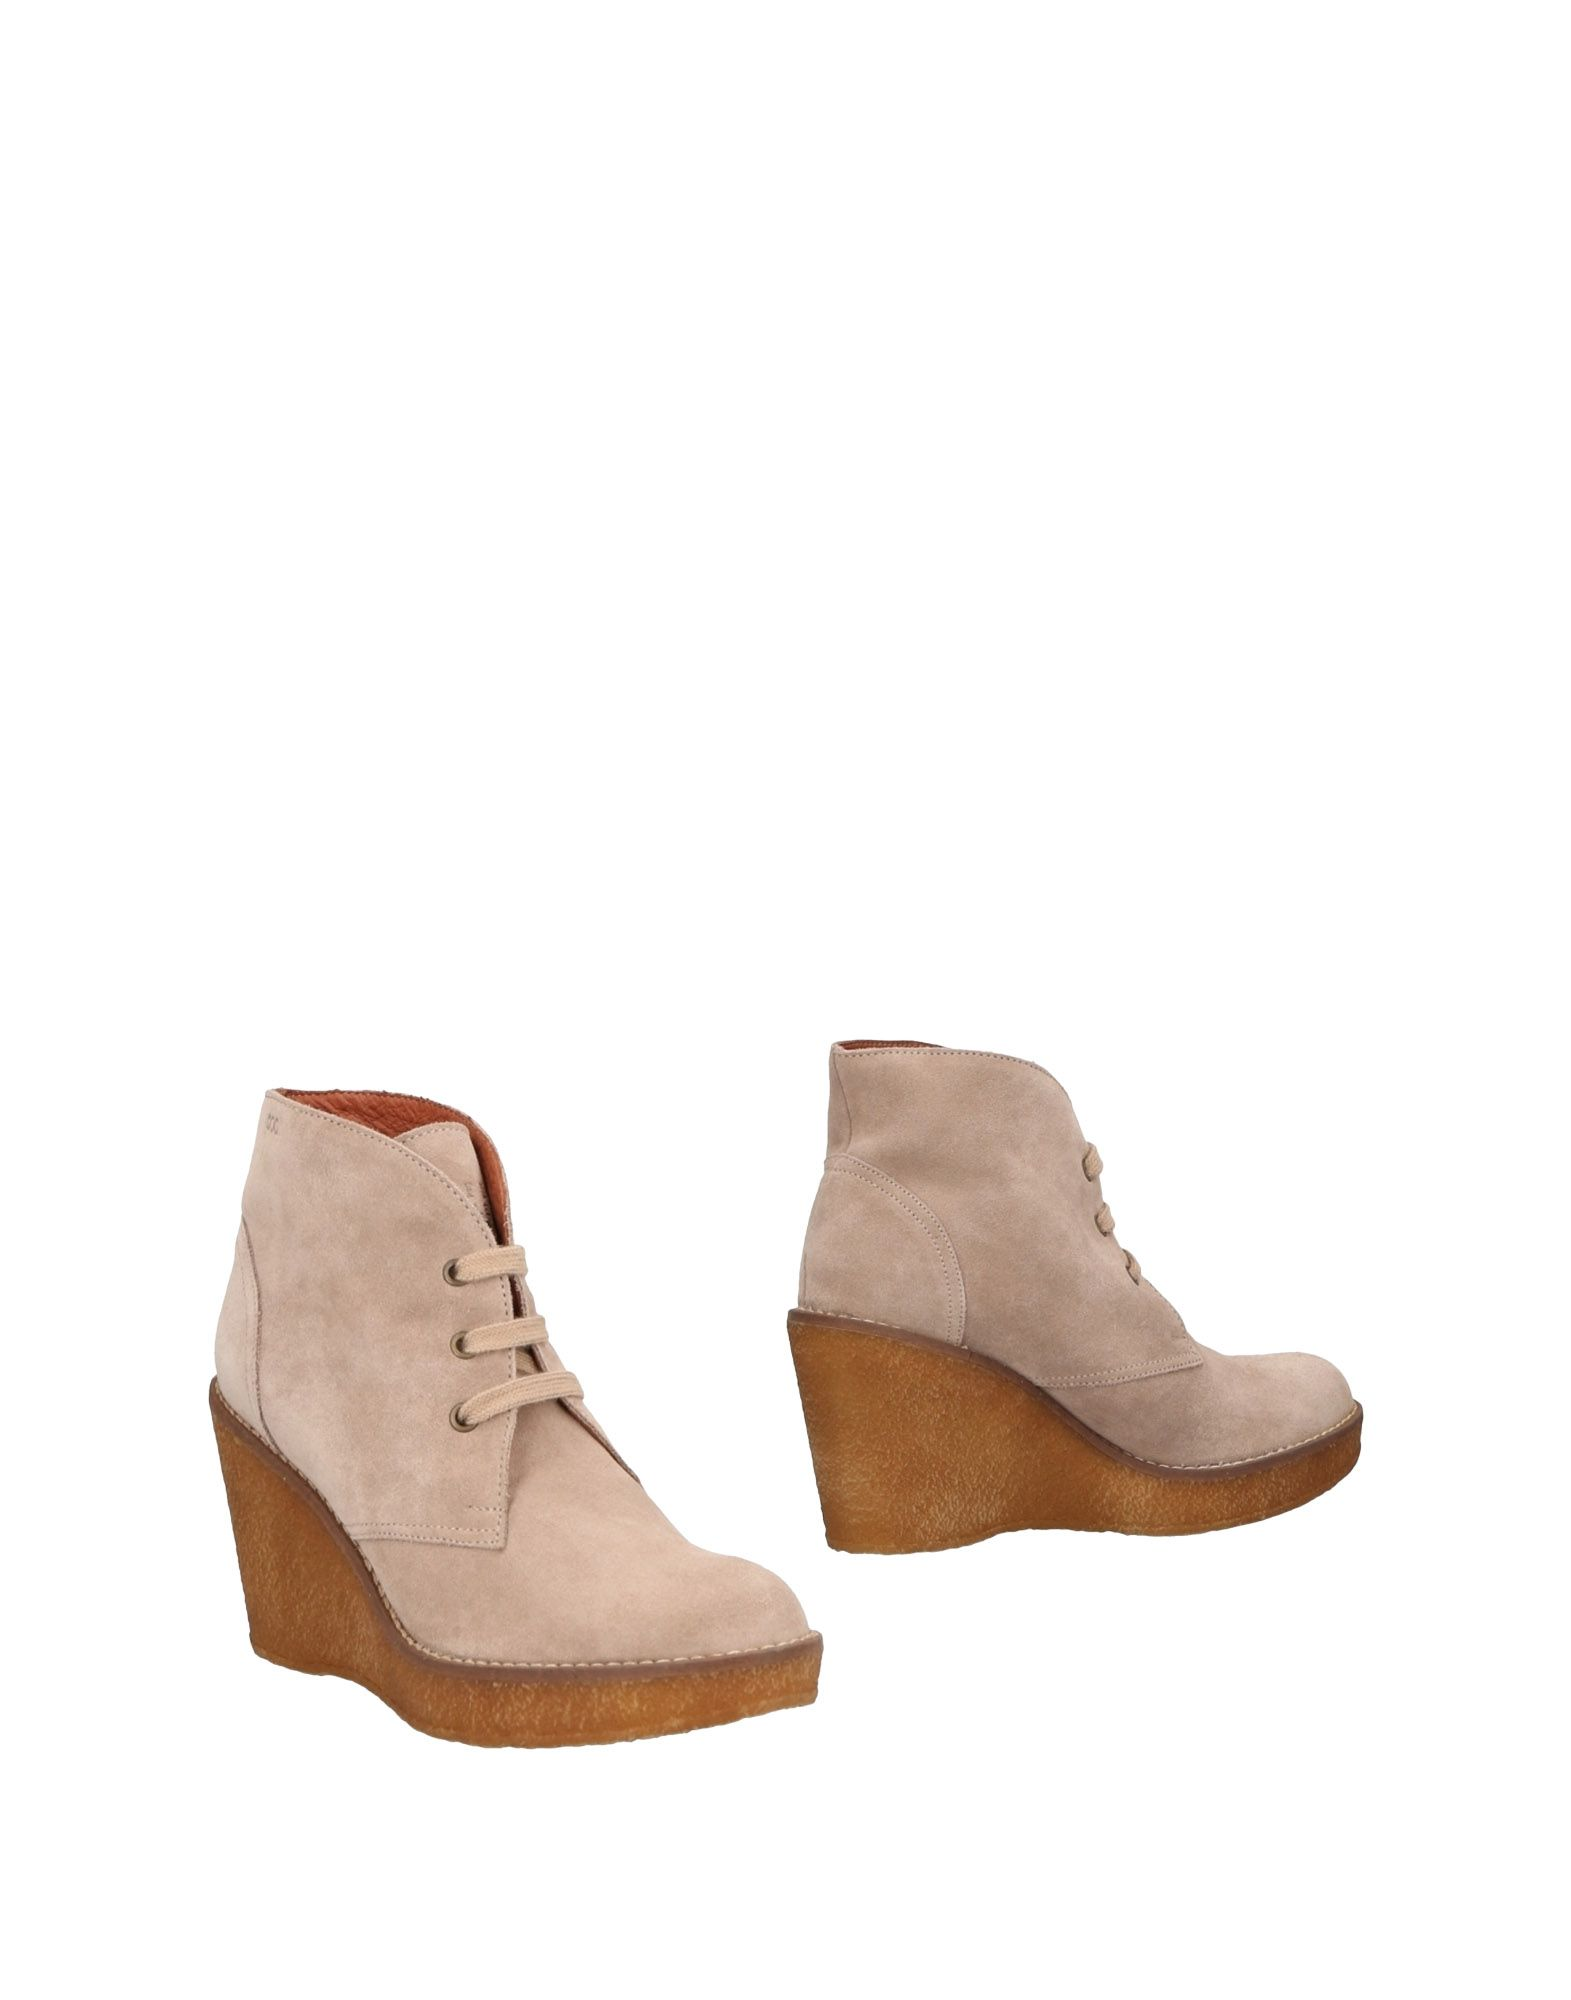 Stilvolle billige Schuhe Serafini Etoile 11471864GX Stiefelette Damen  11471864GX Etoile 1a31c3